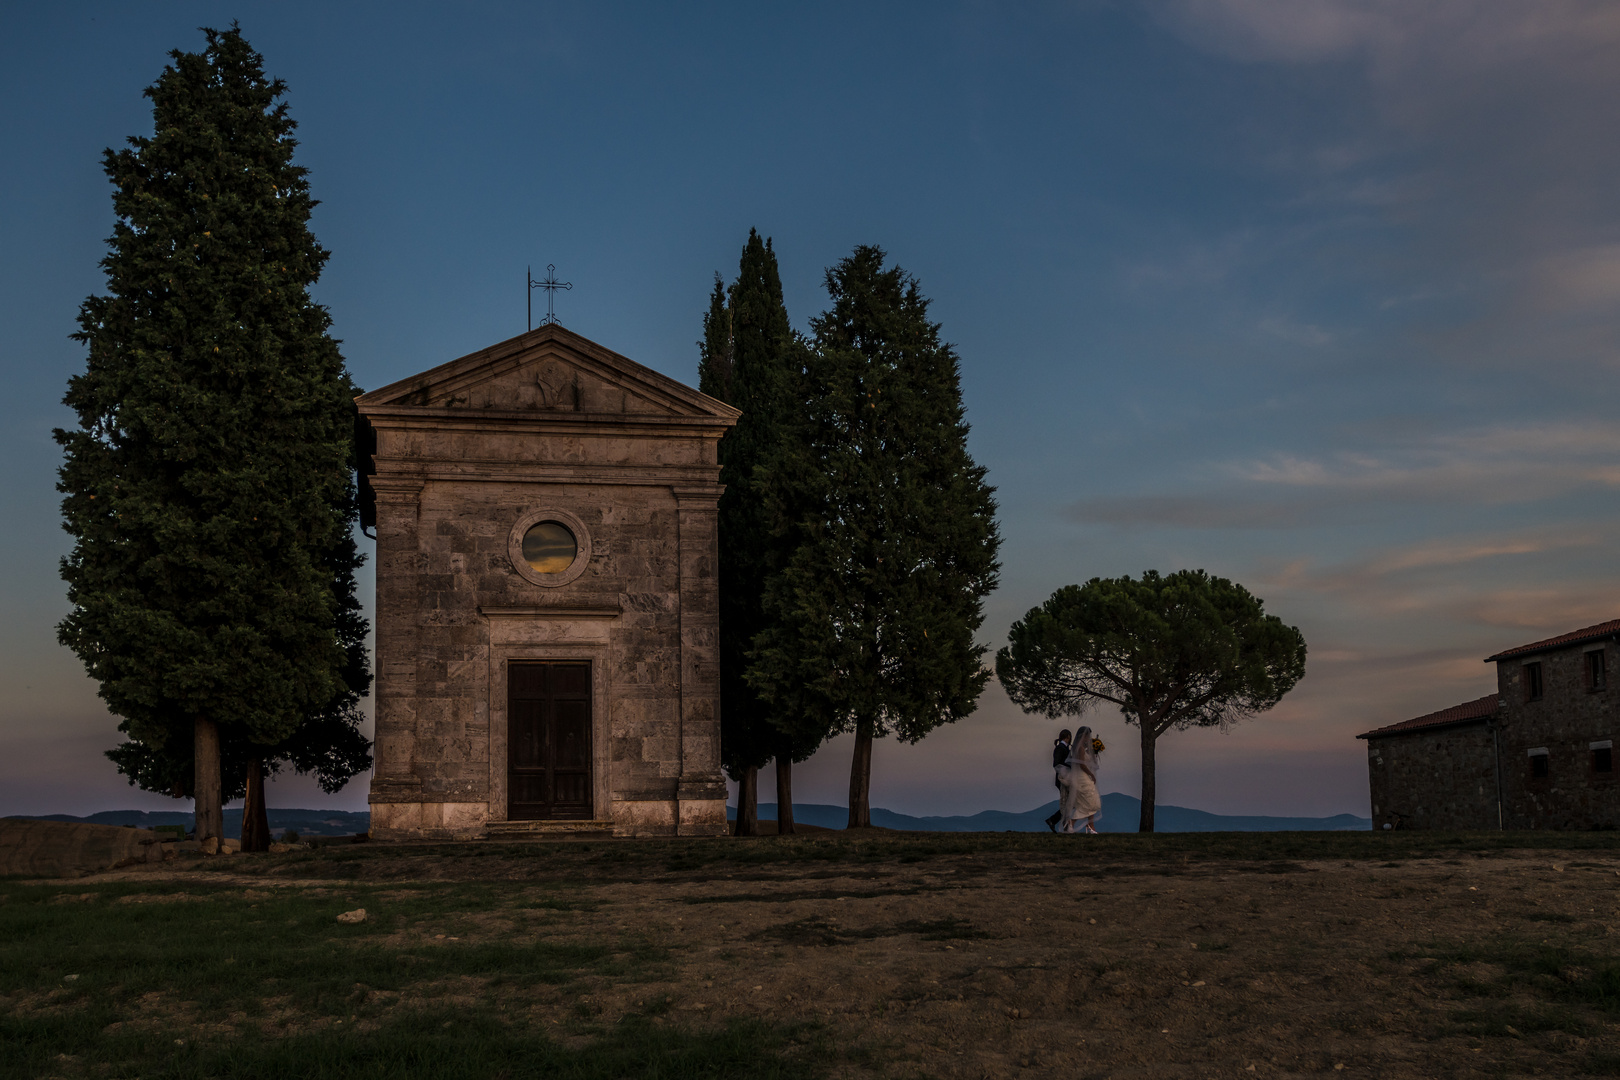 Cappella della Madonna di Vitaleta, Toskana, Italien, Hochzeit, Brautpaar